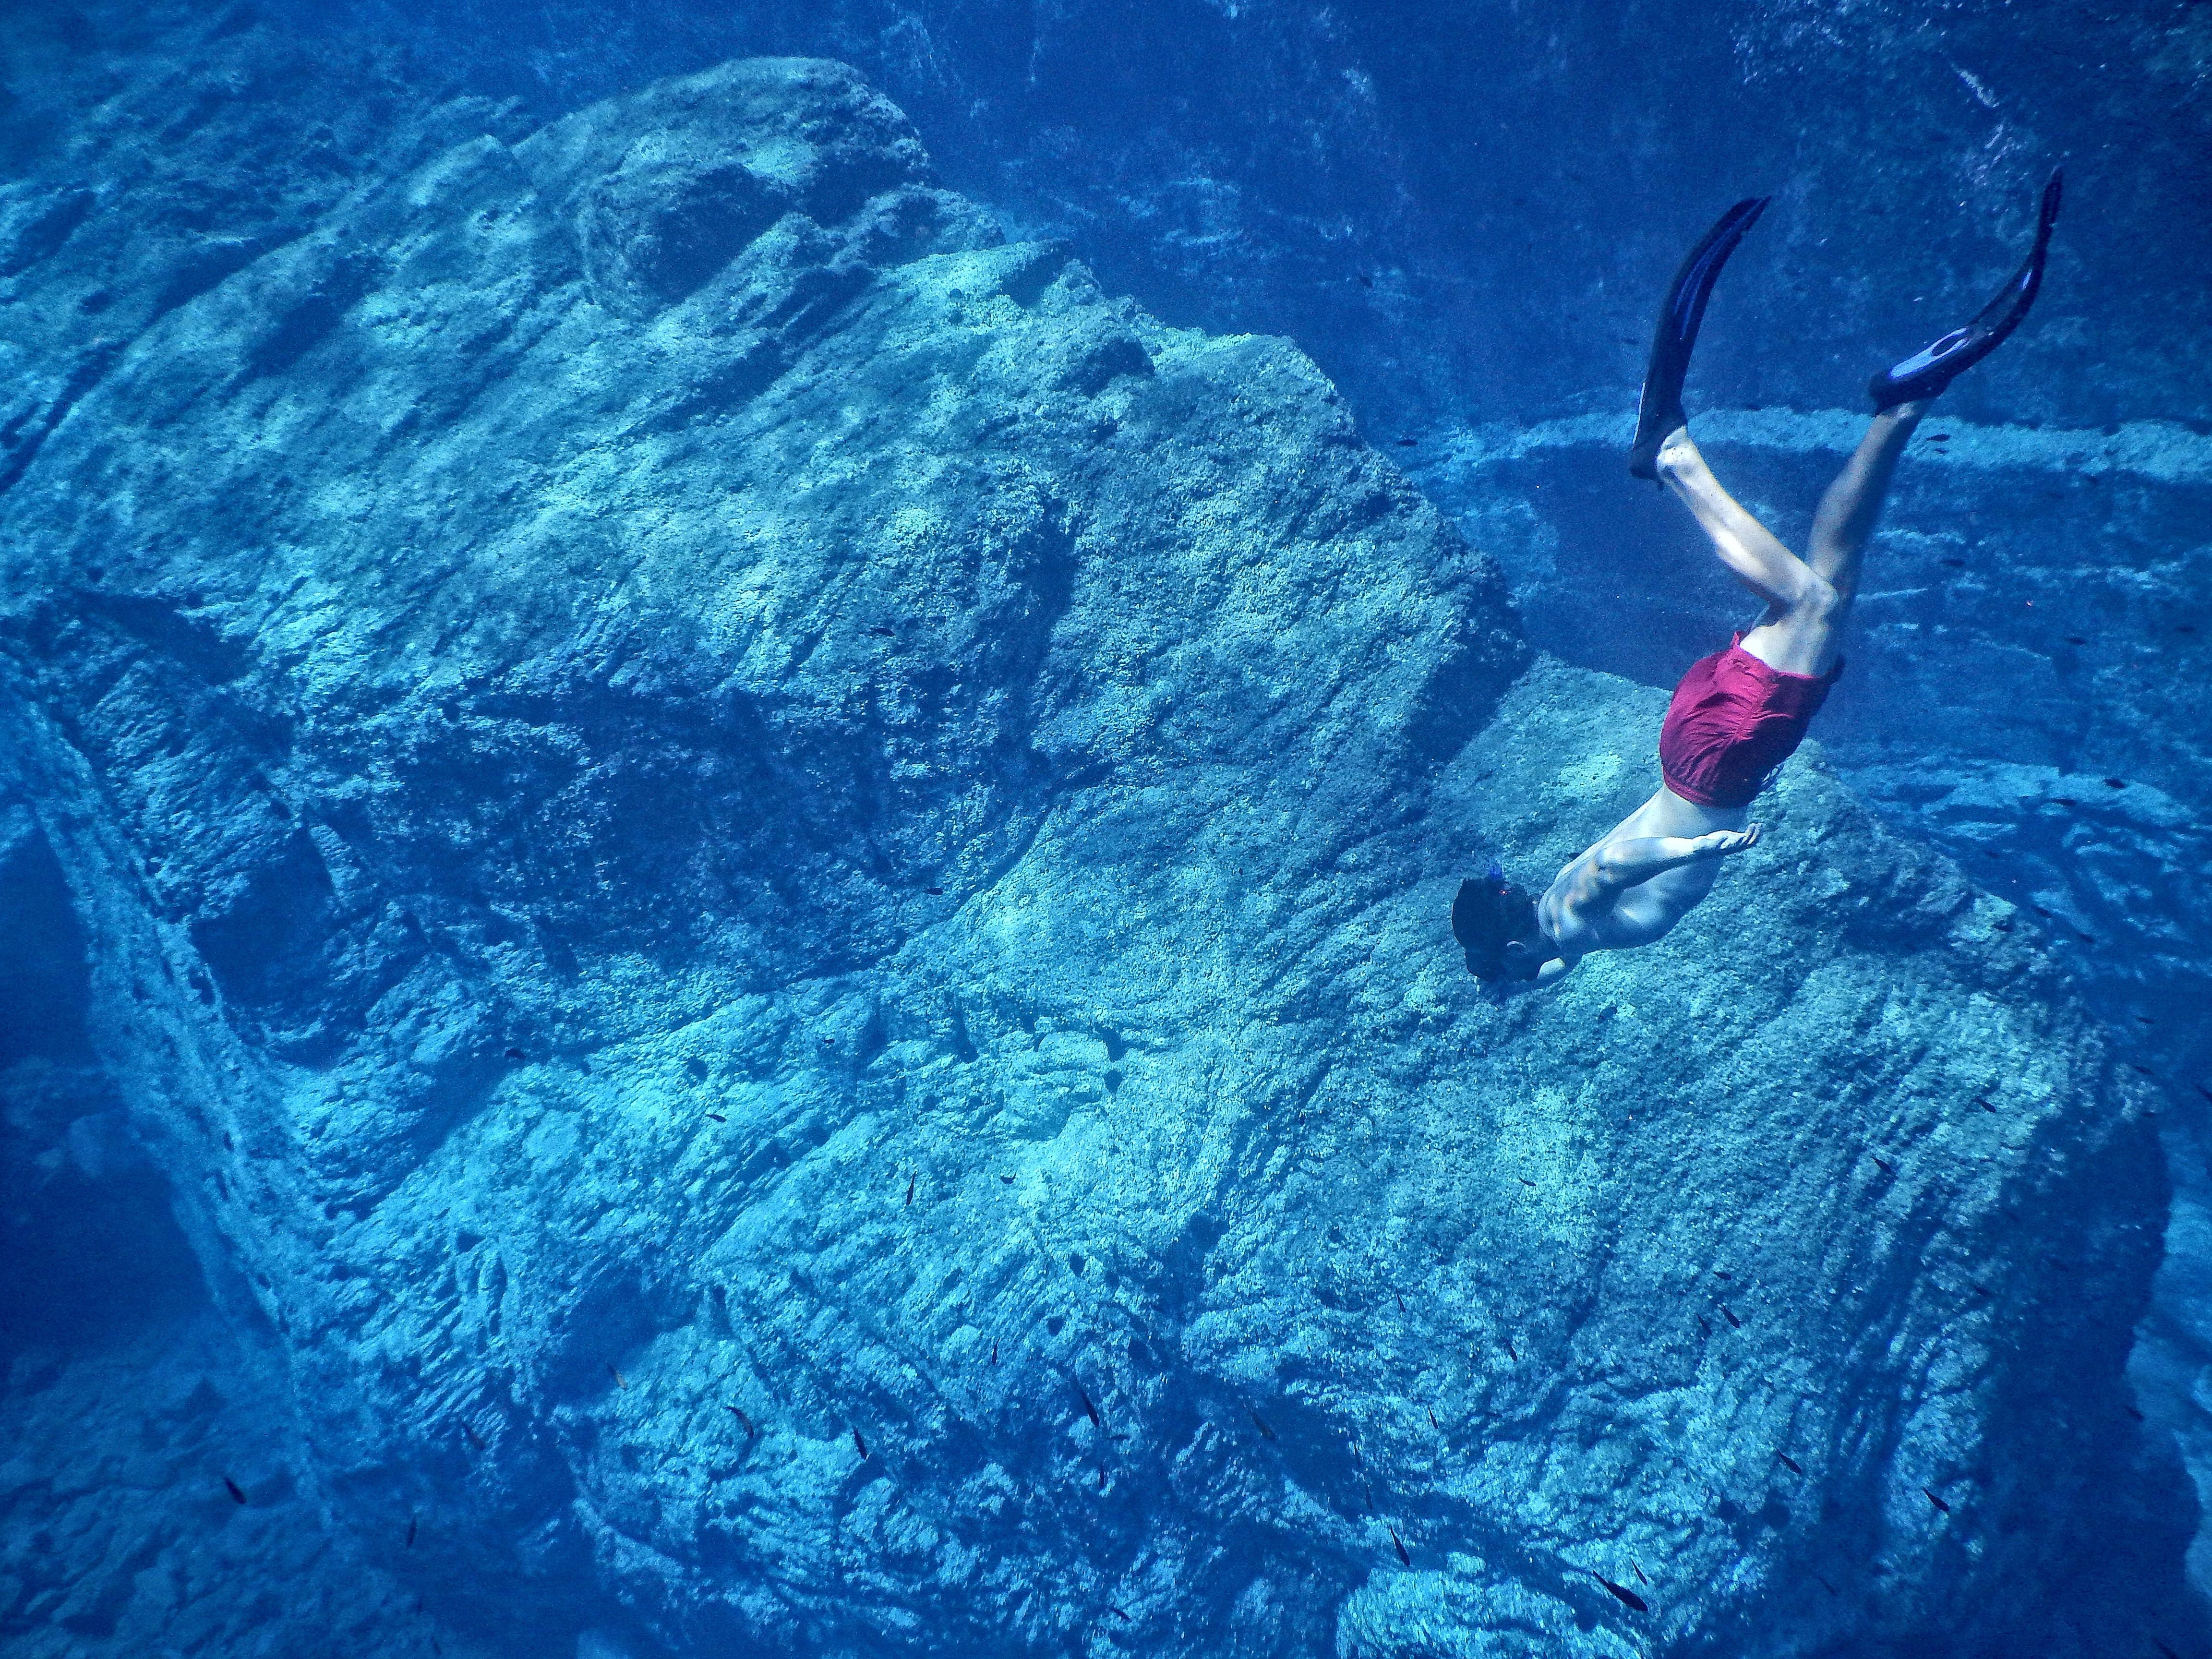 man in red shorts swimming near huge underwater rock